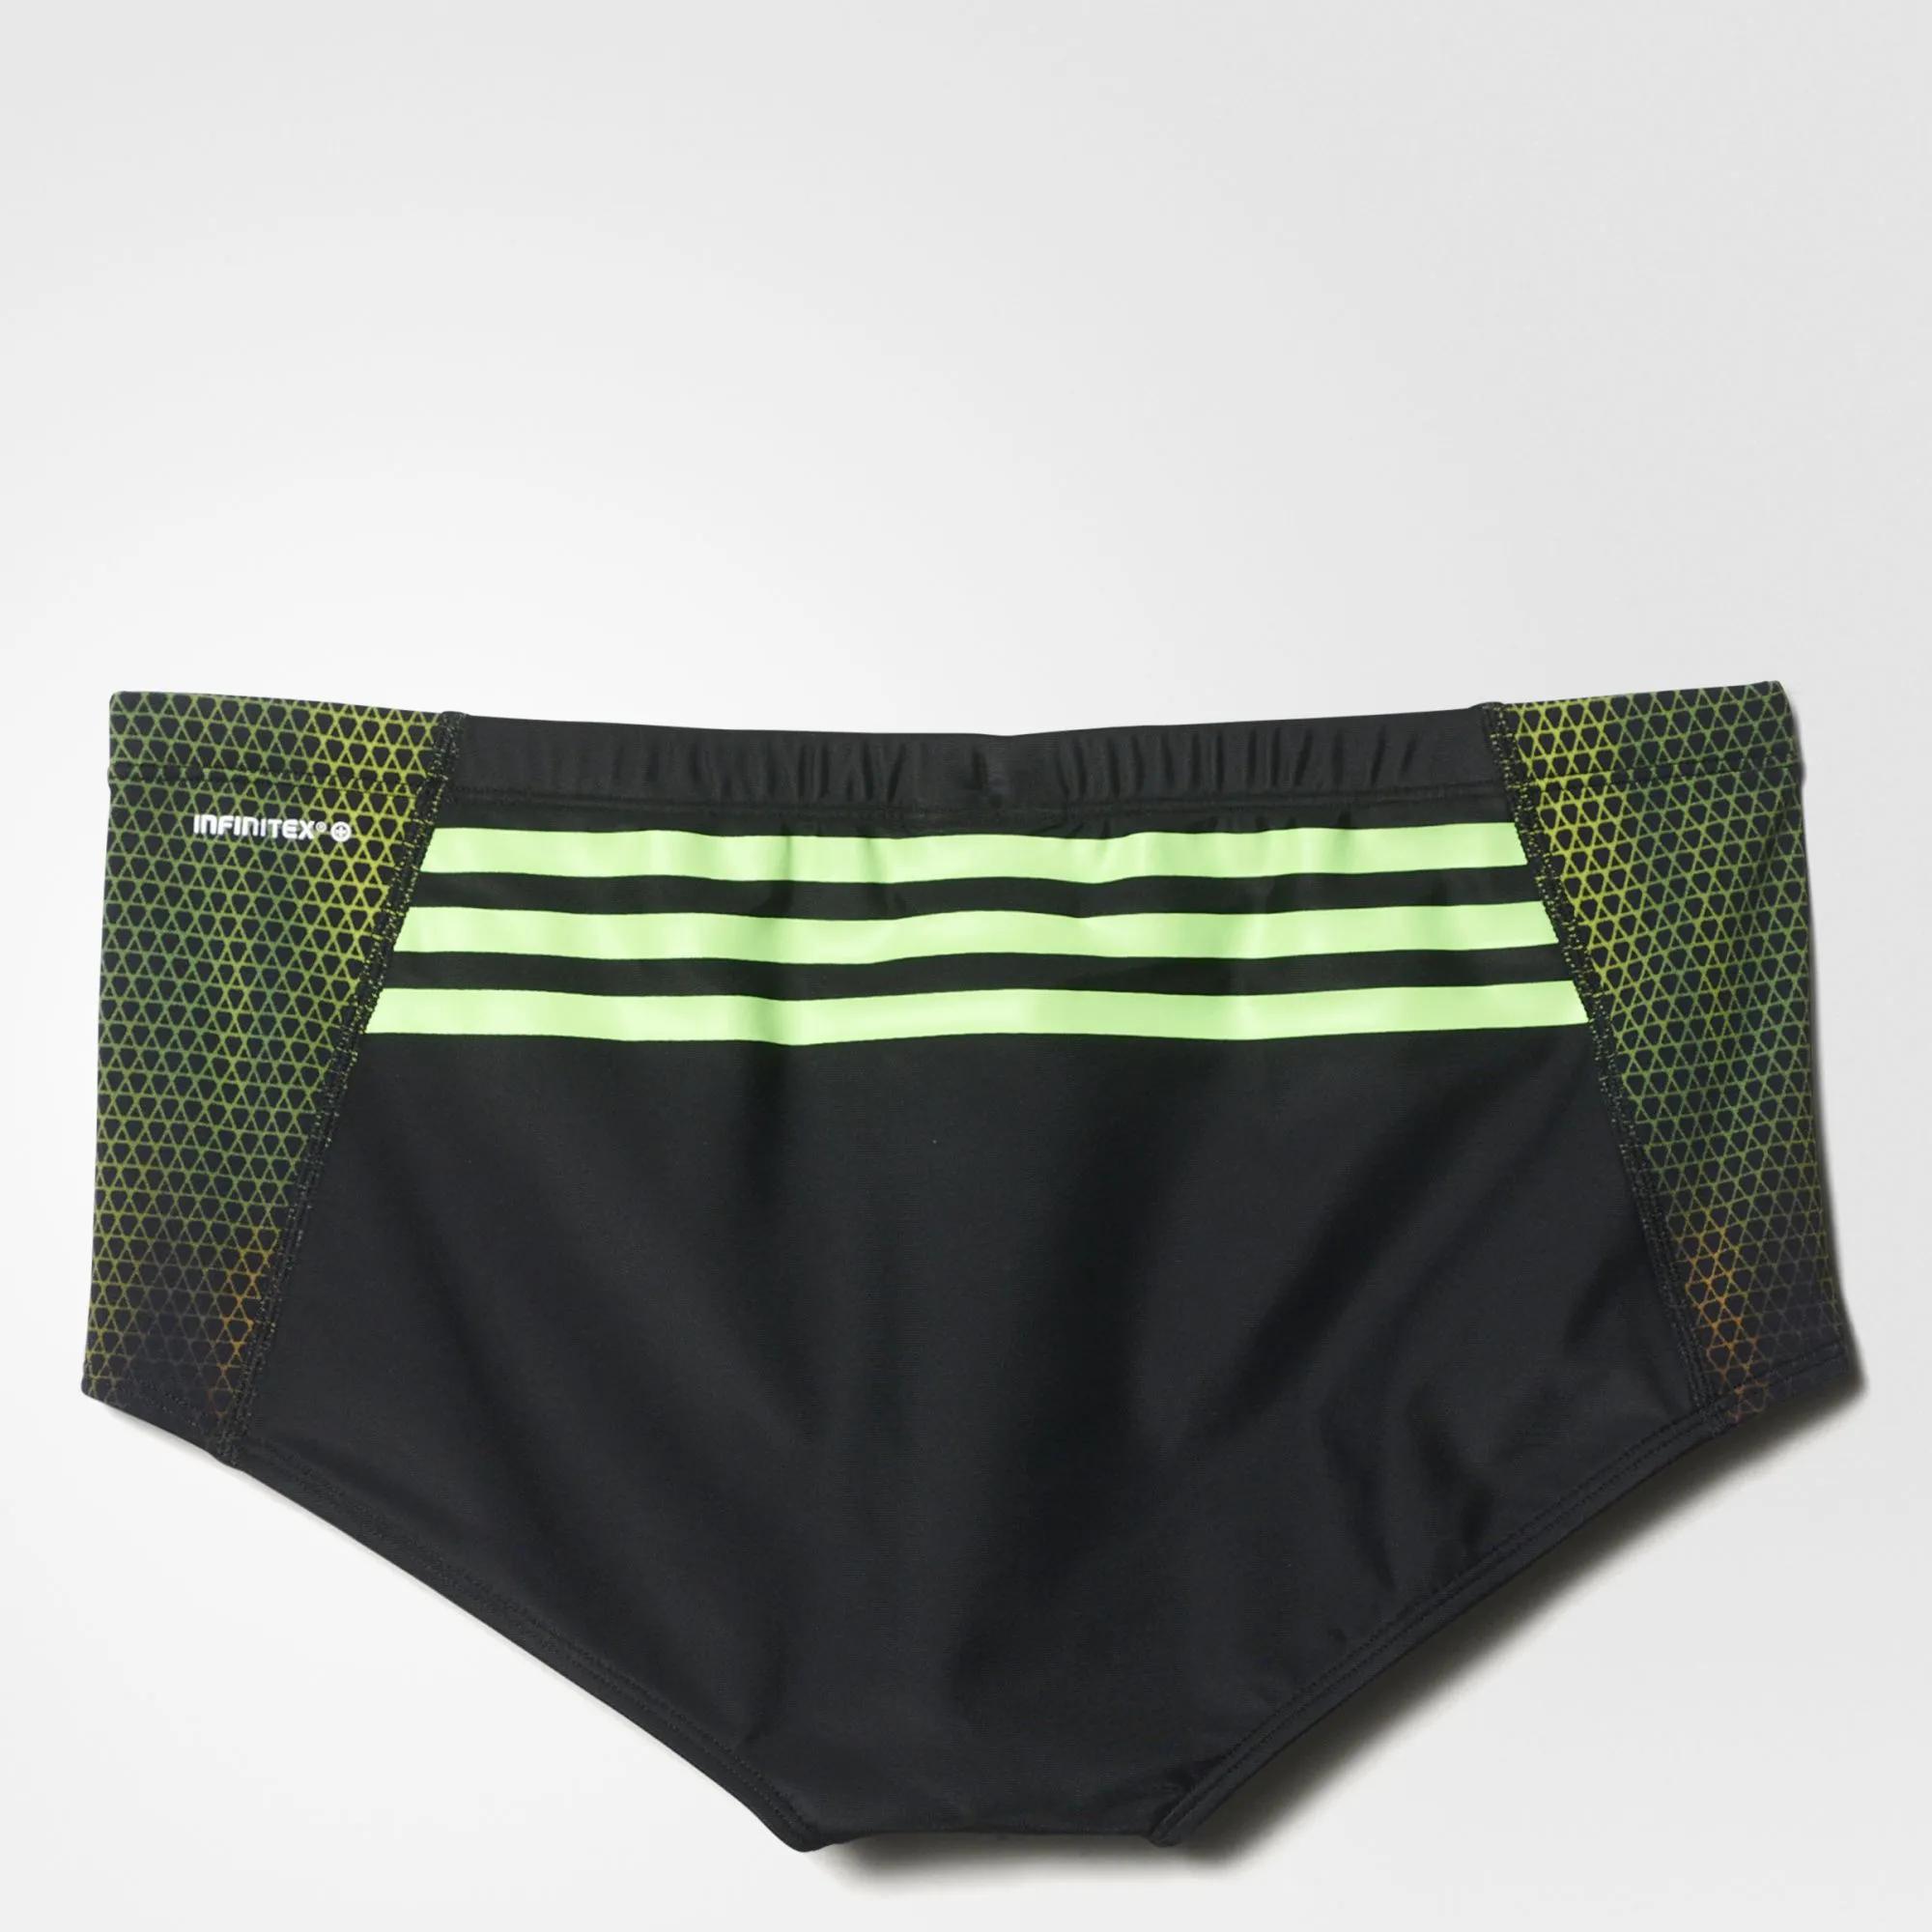 Sunga adidas Cesar Cielo Infinitex Ed Especial Lateral Larga